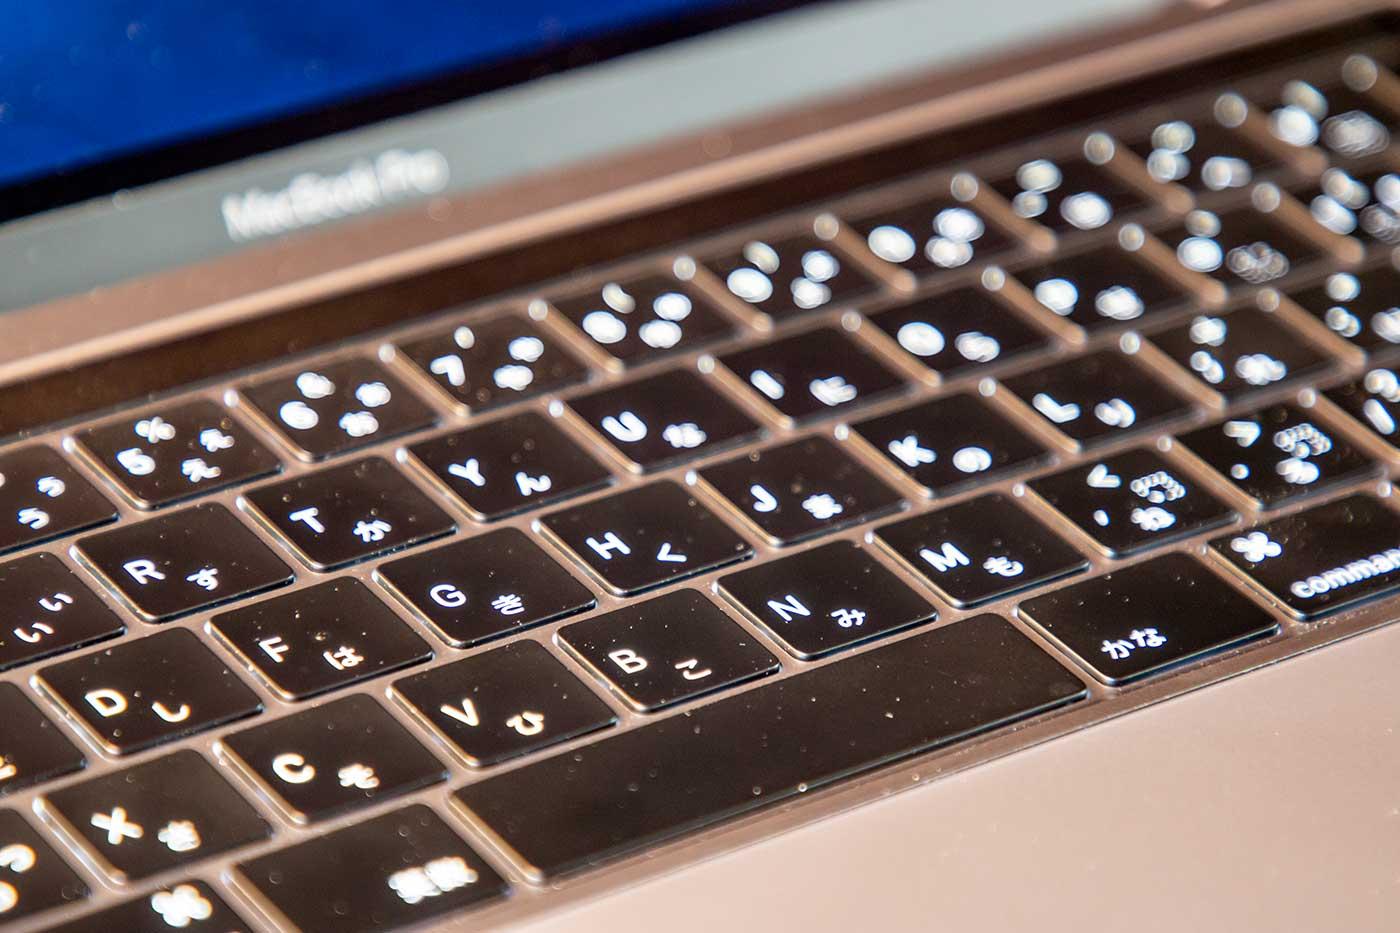 MacBook Proのバタフライ式キーボード